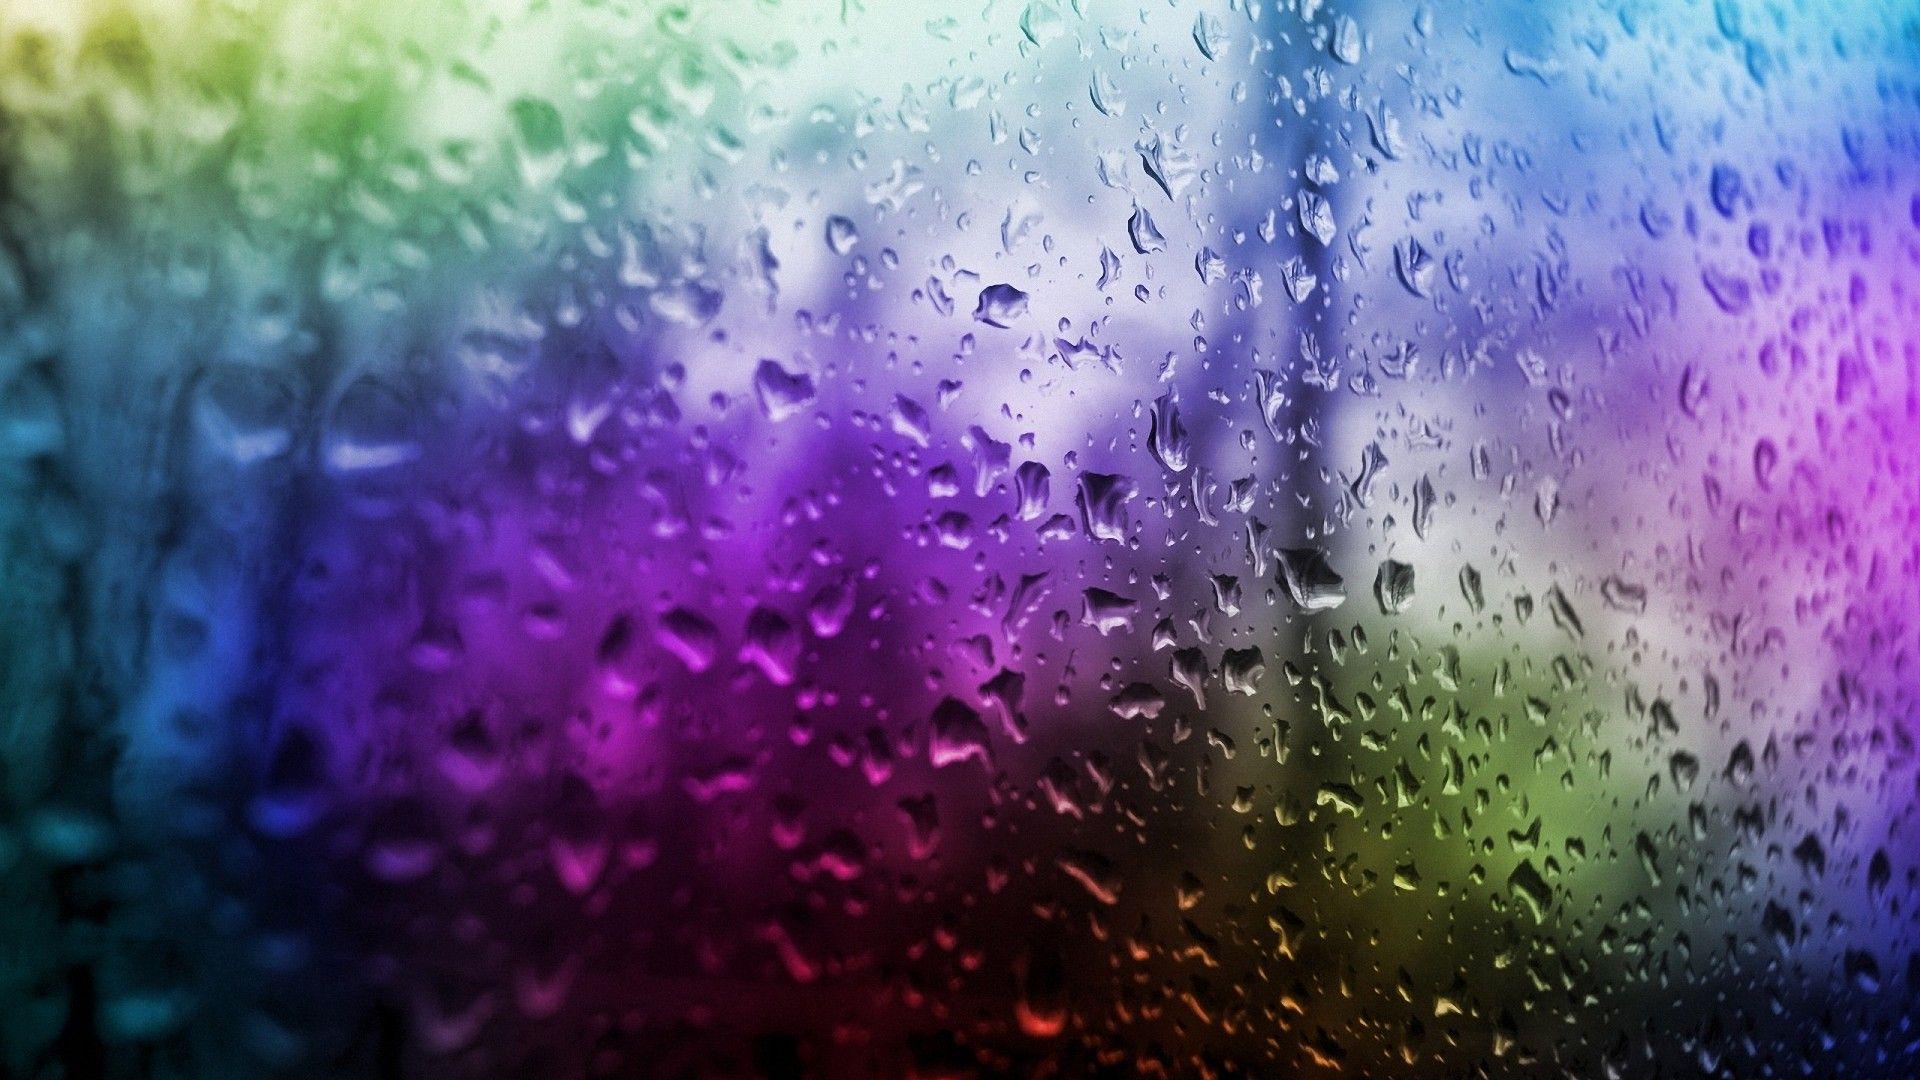 Colorful Water Drop Window Hd Wallpapers Desktop Backgrounds Abstract Wallpaper Abstract Widescreen Wallpaper